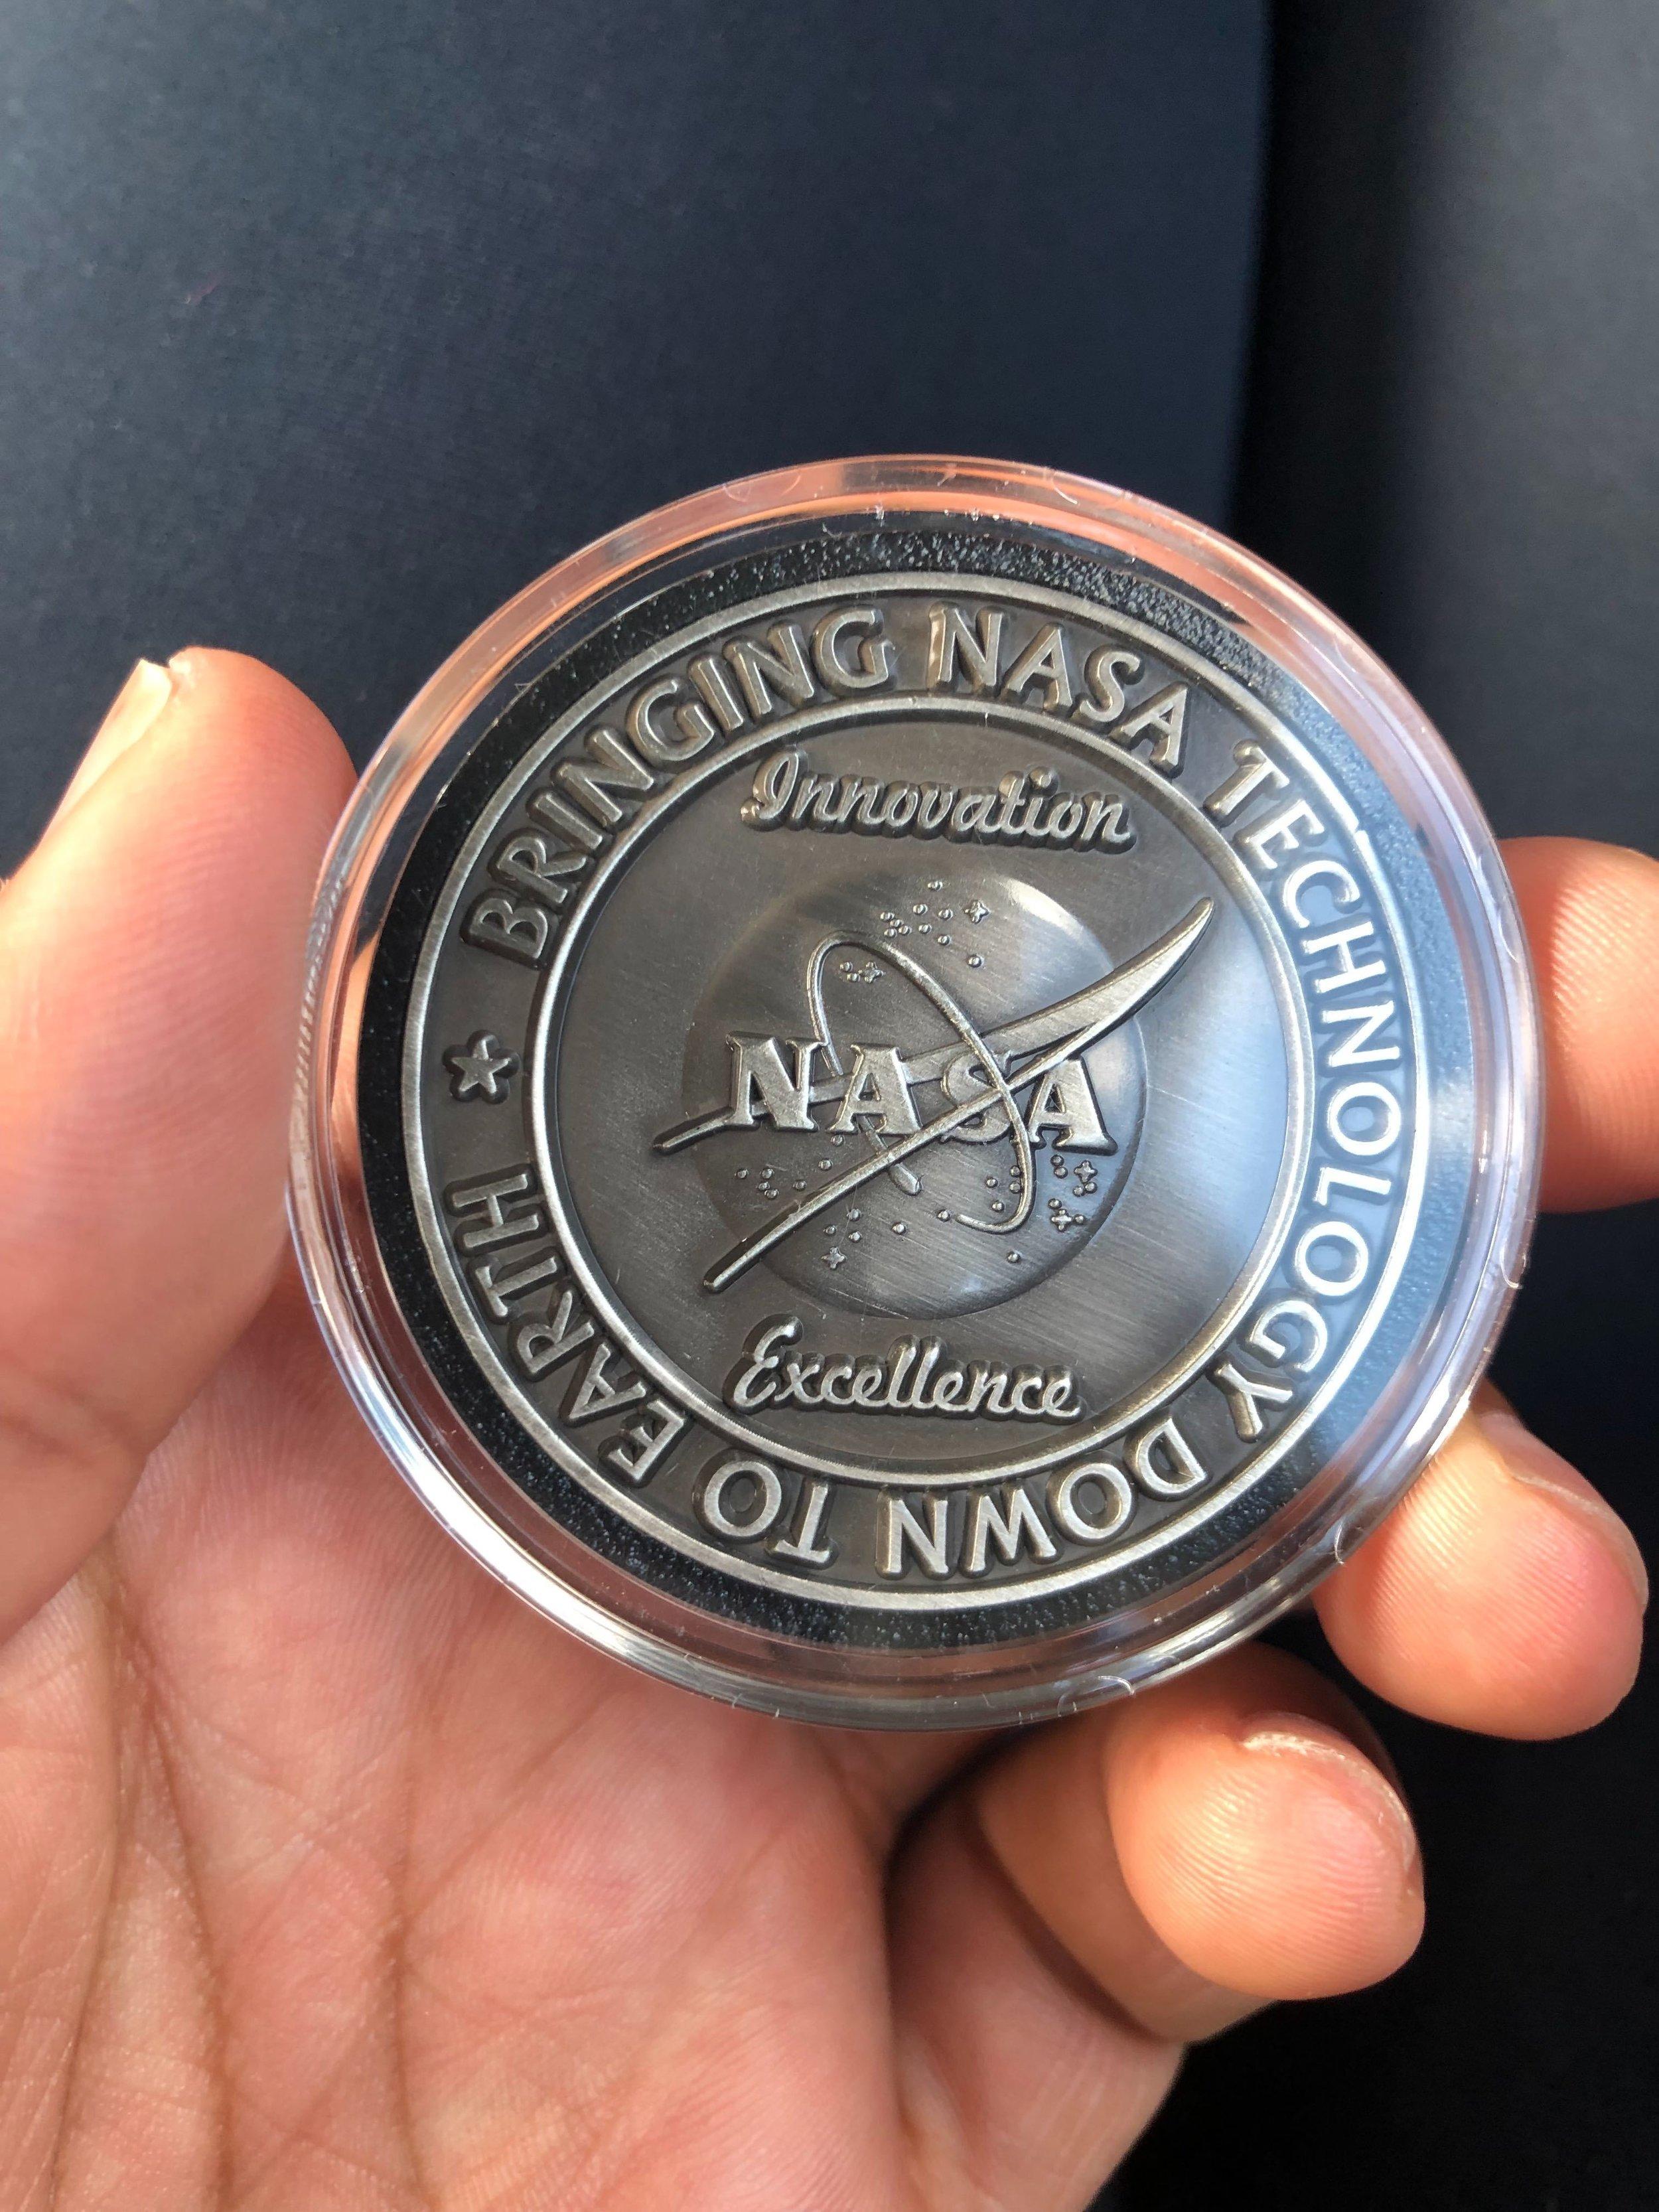 NASA's OPSPARC program awarded us a medal!